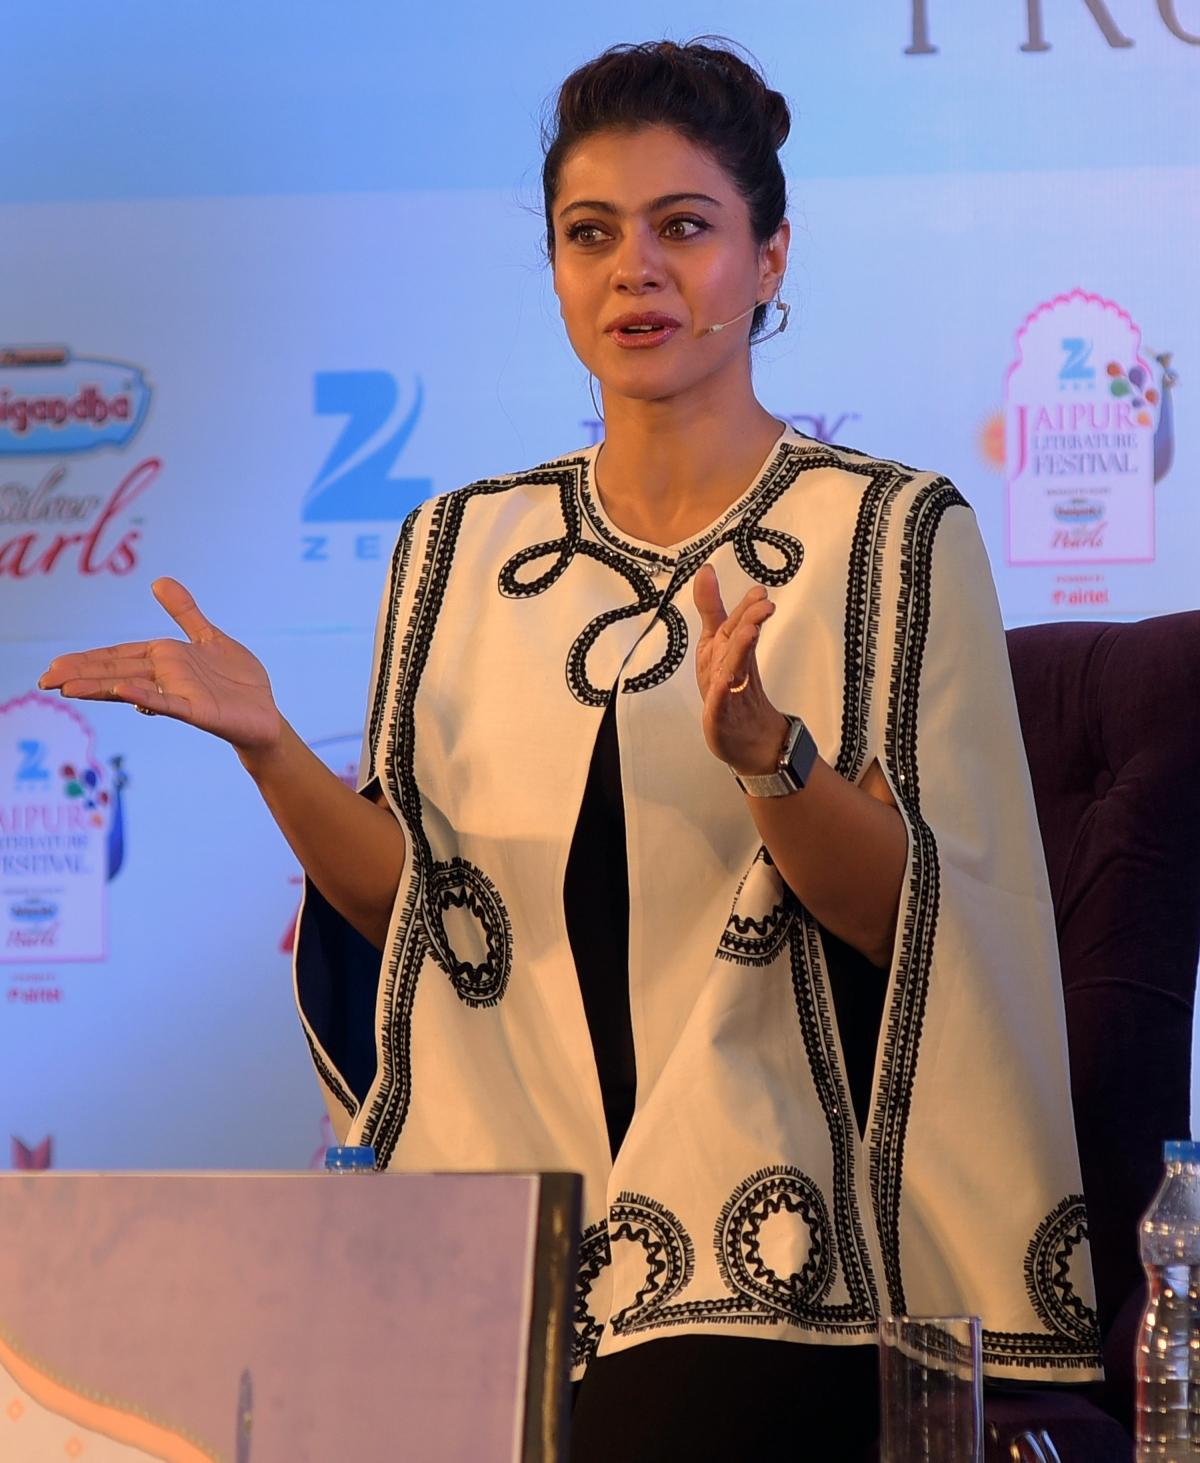 Kajol at Jaipur Literature Festival